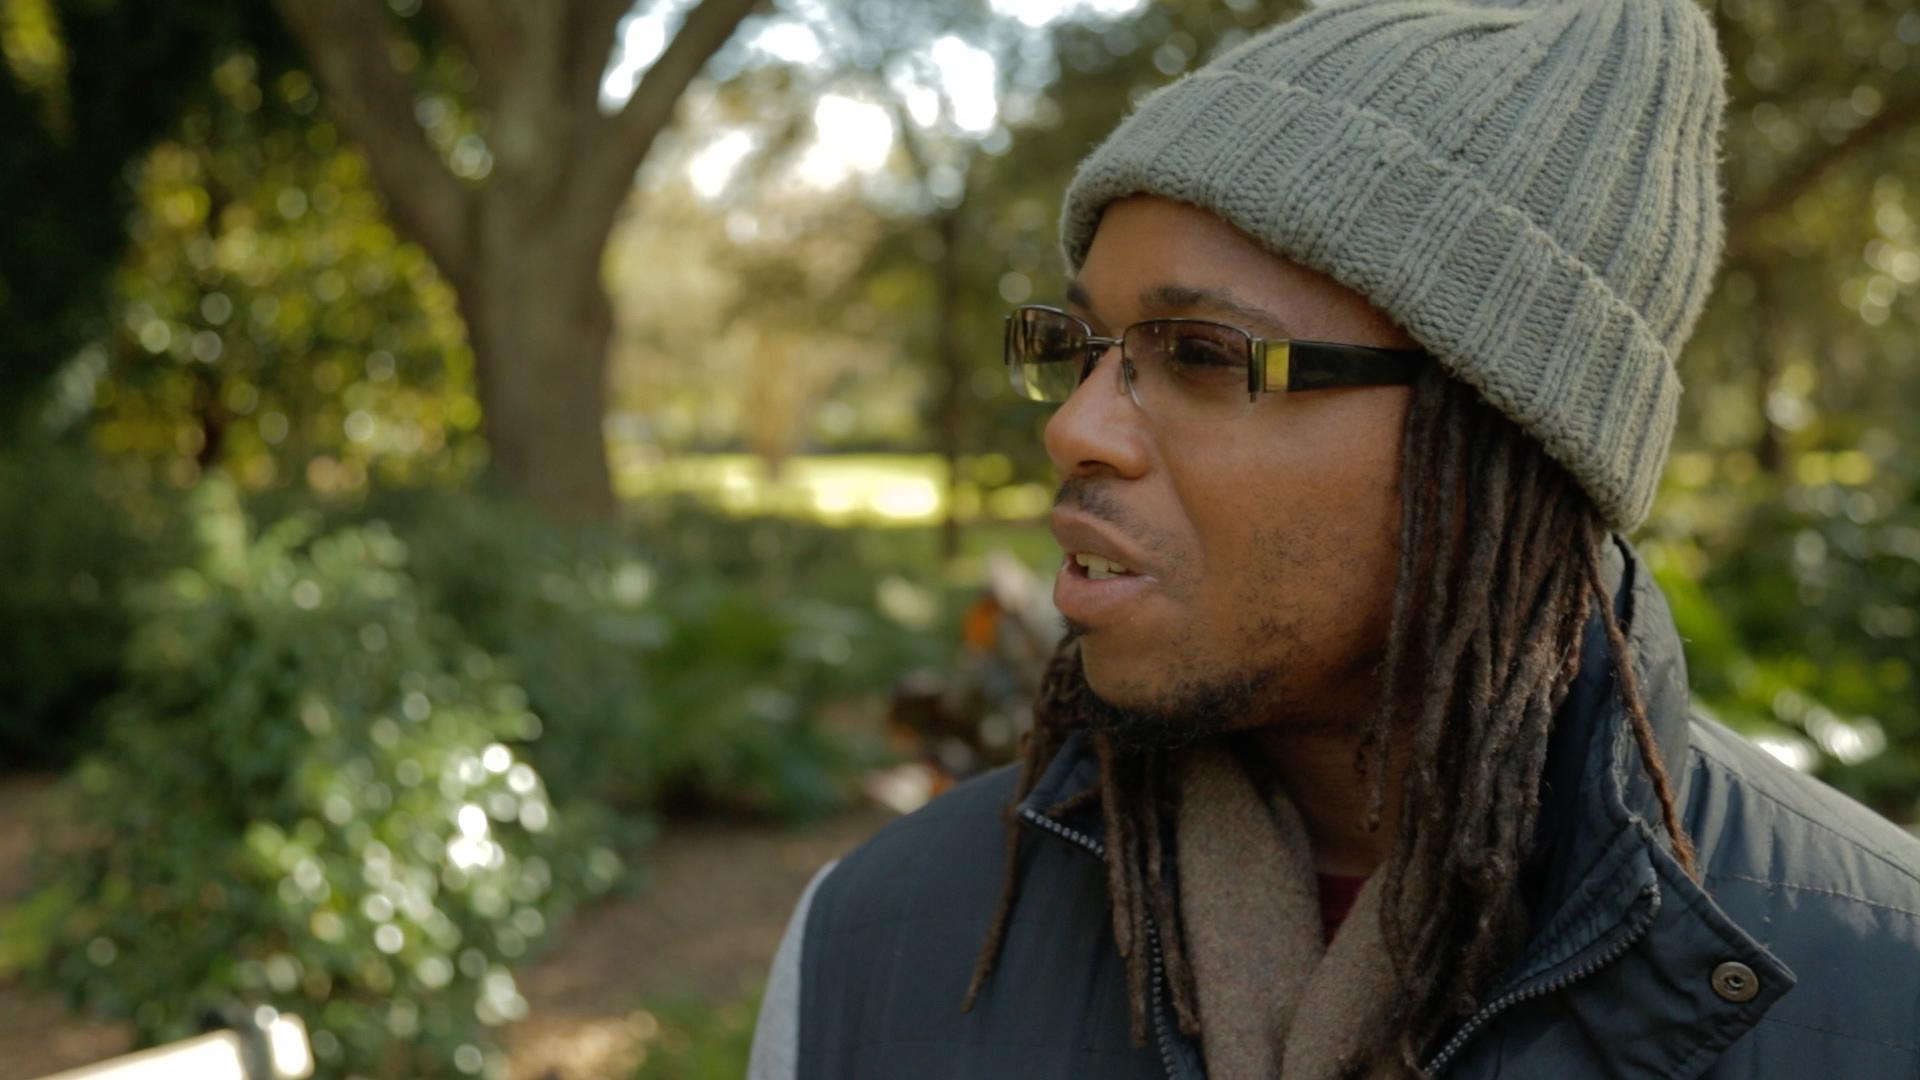 Frame 394 Still024 - Muhiyidin d'Baha of Black Lives Matter Charleston.jpg